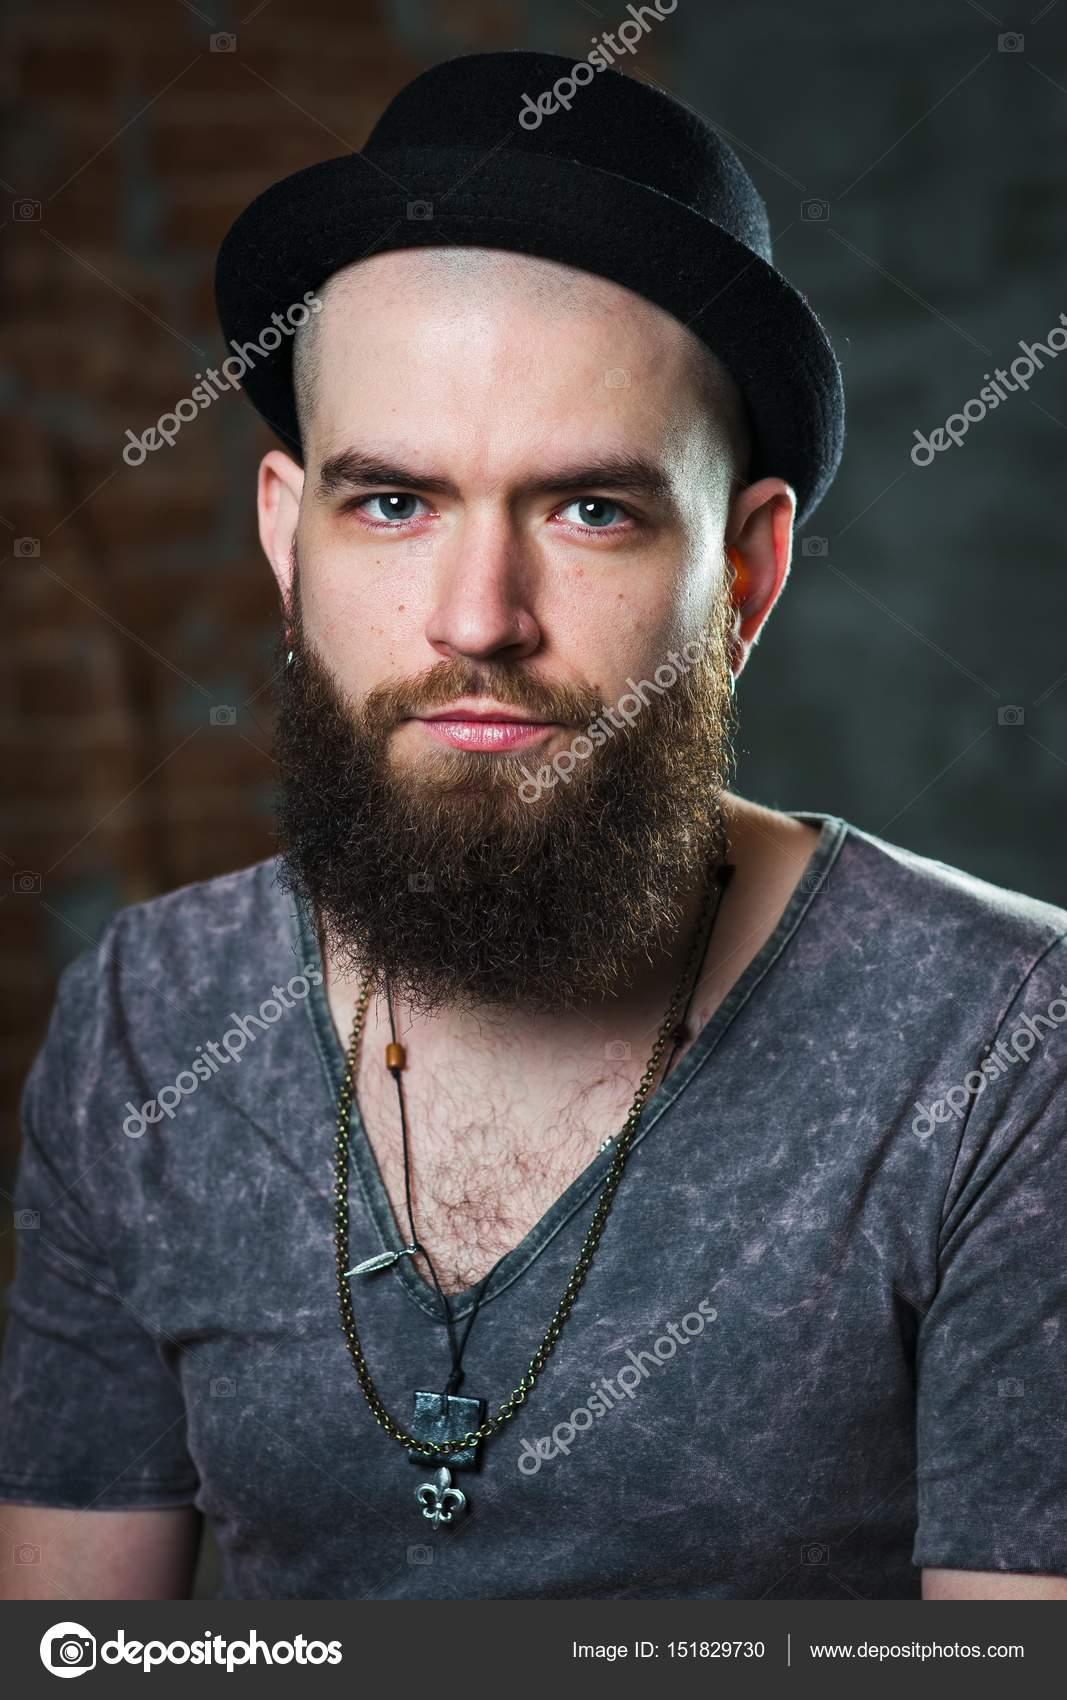 portrait of a bearded guy in a hat cute bald guy with a beard